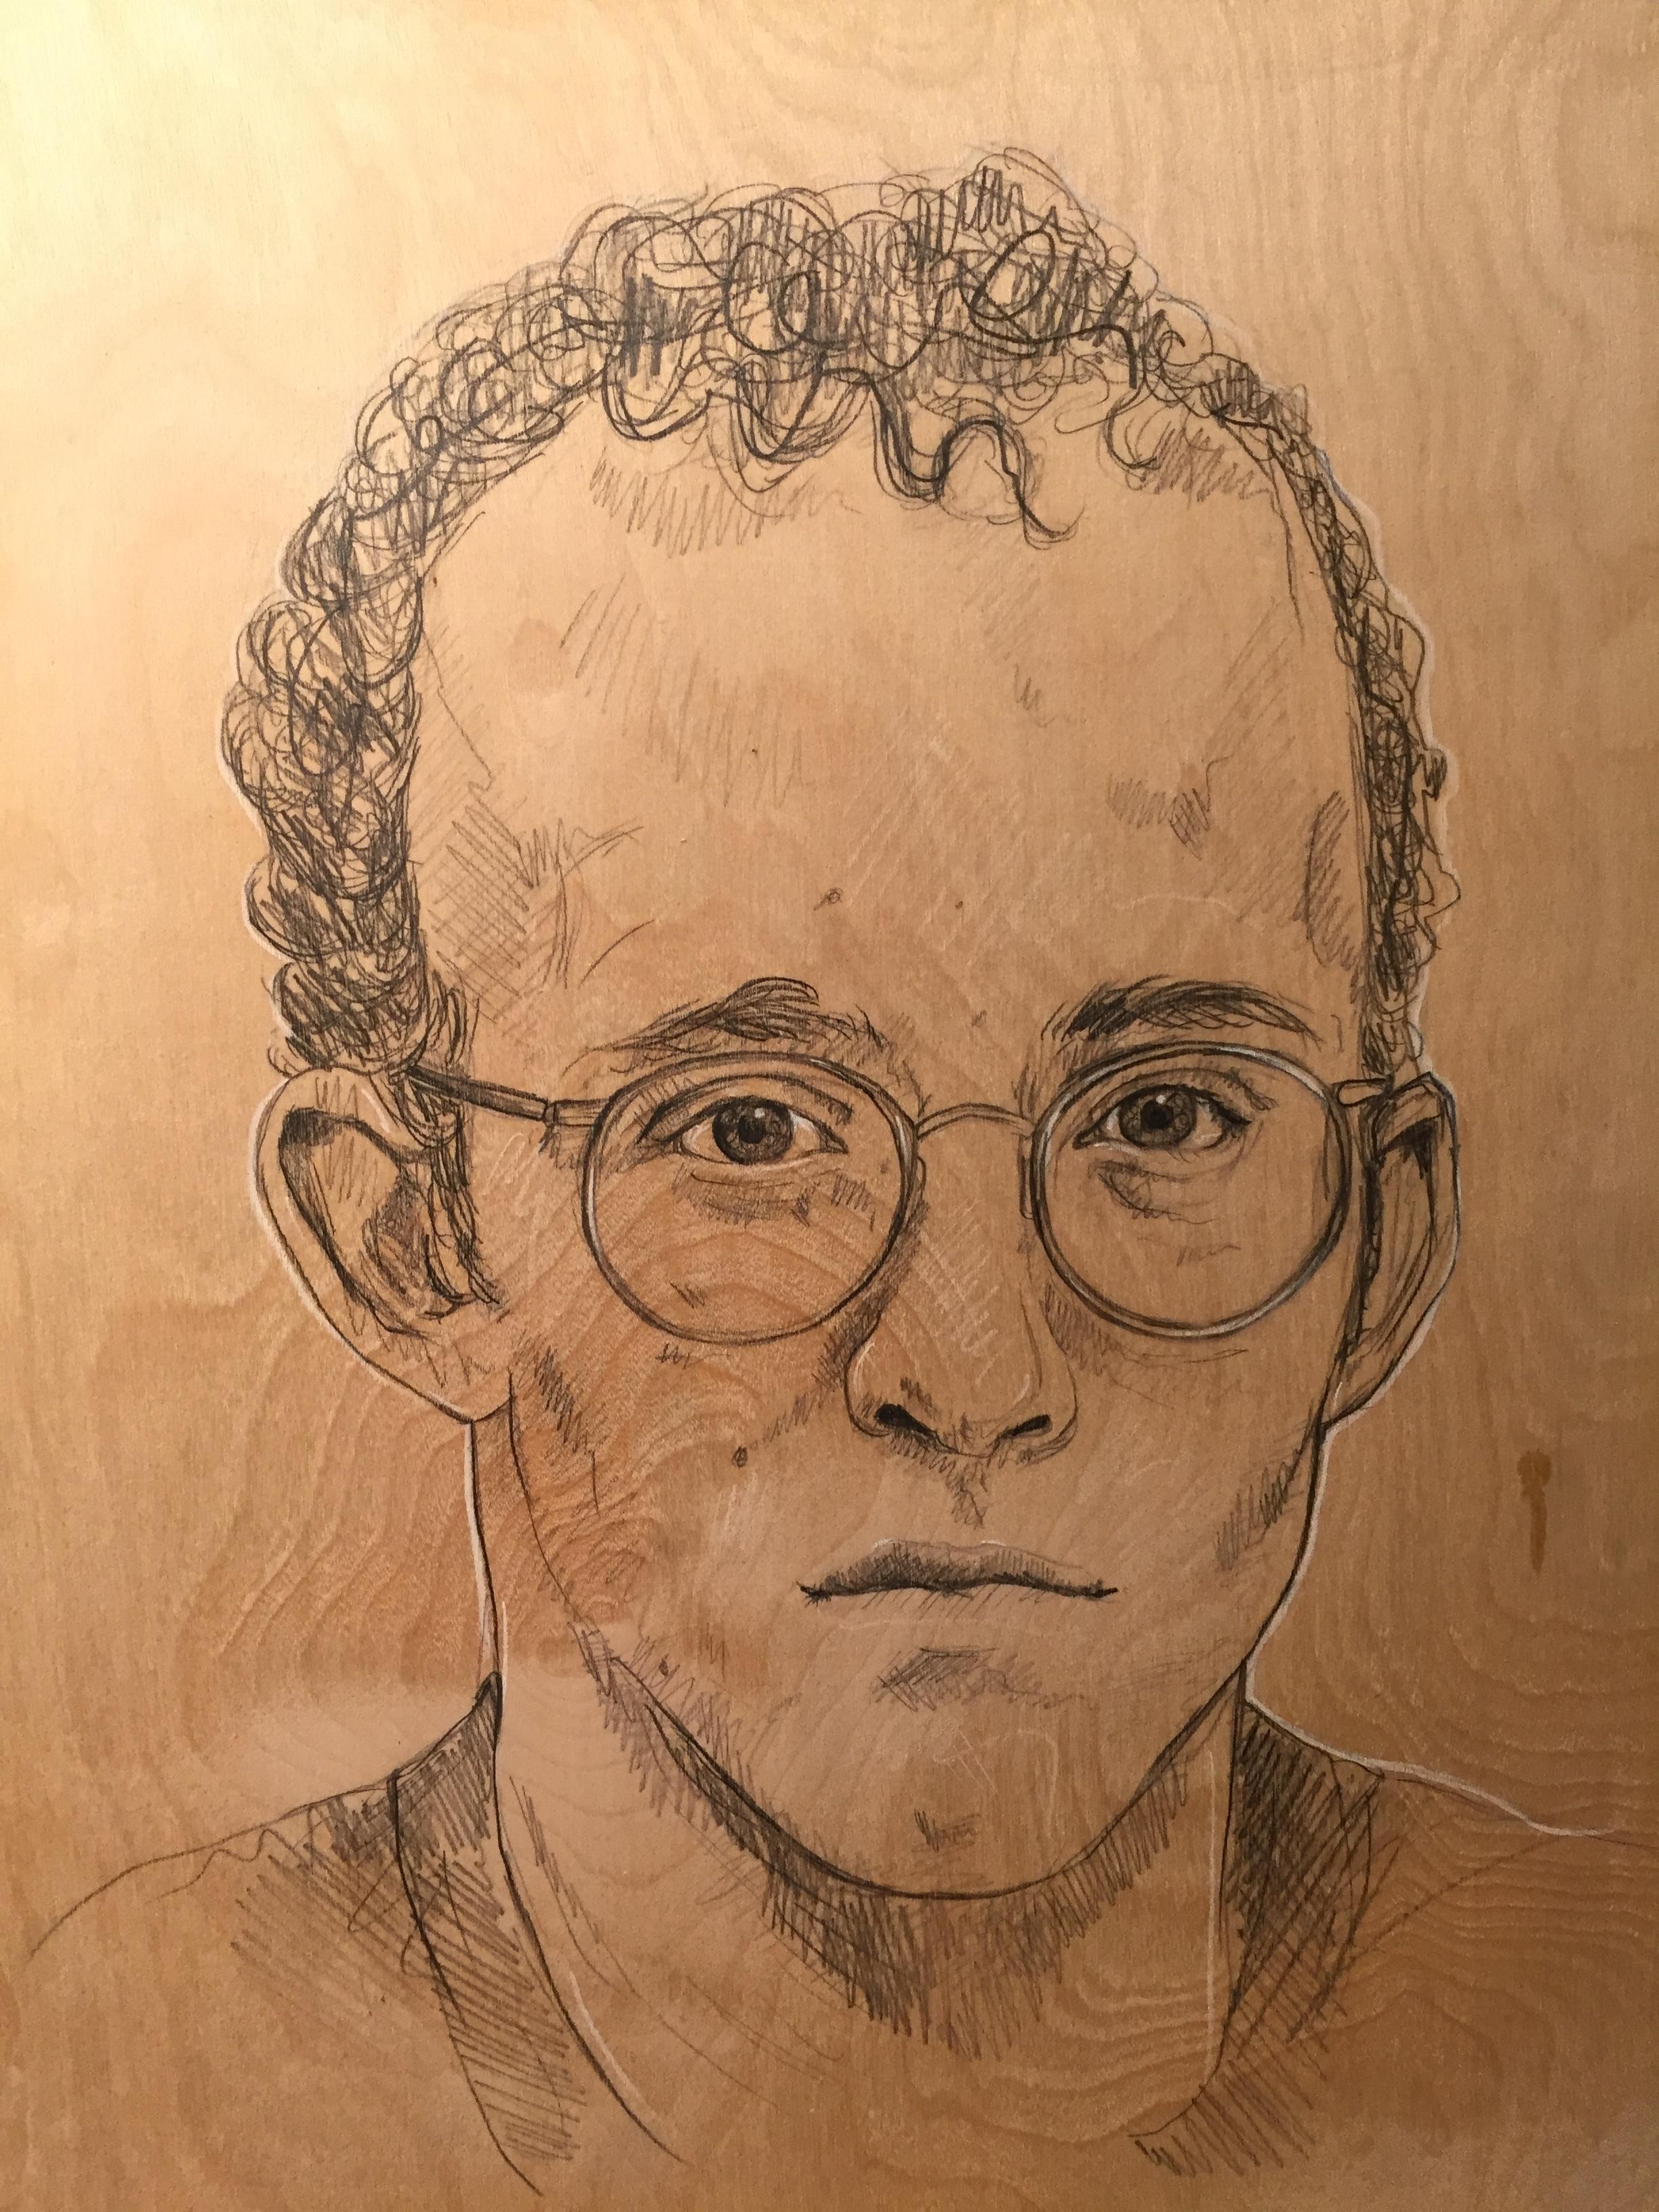 Keith_Haring_mandilla.JPG